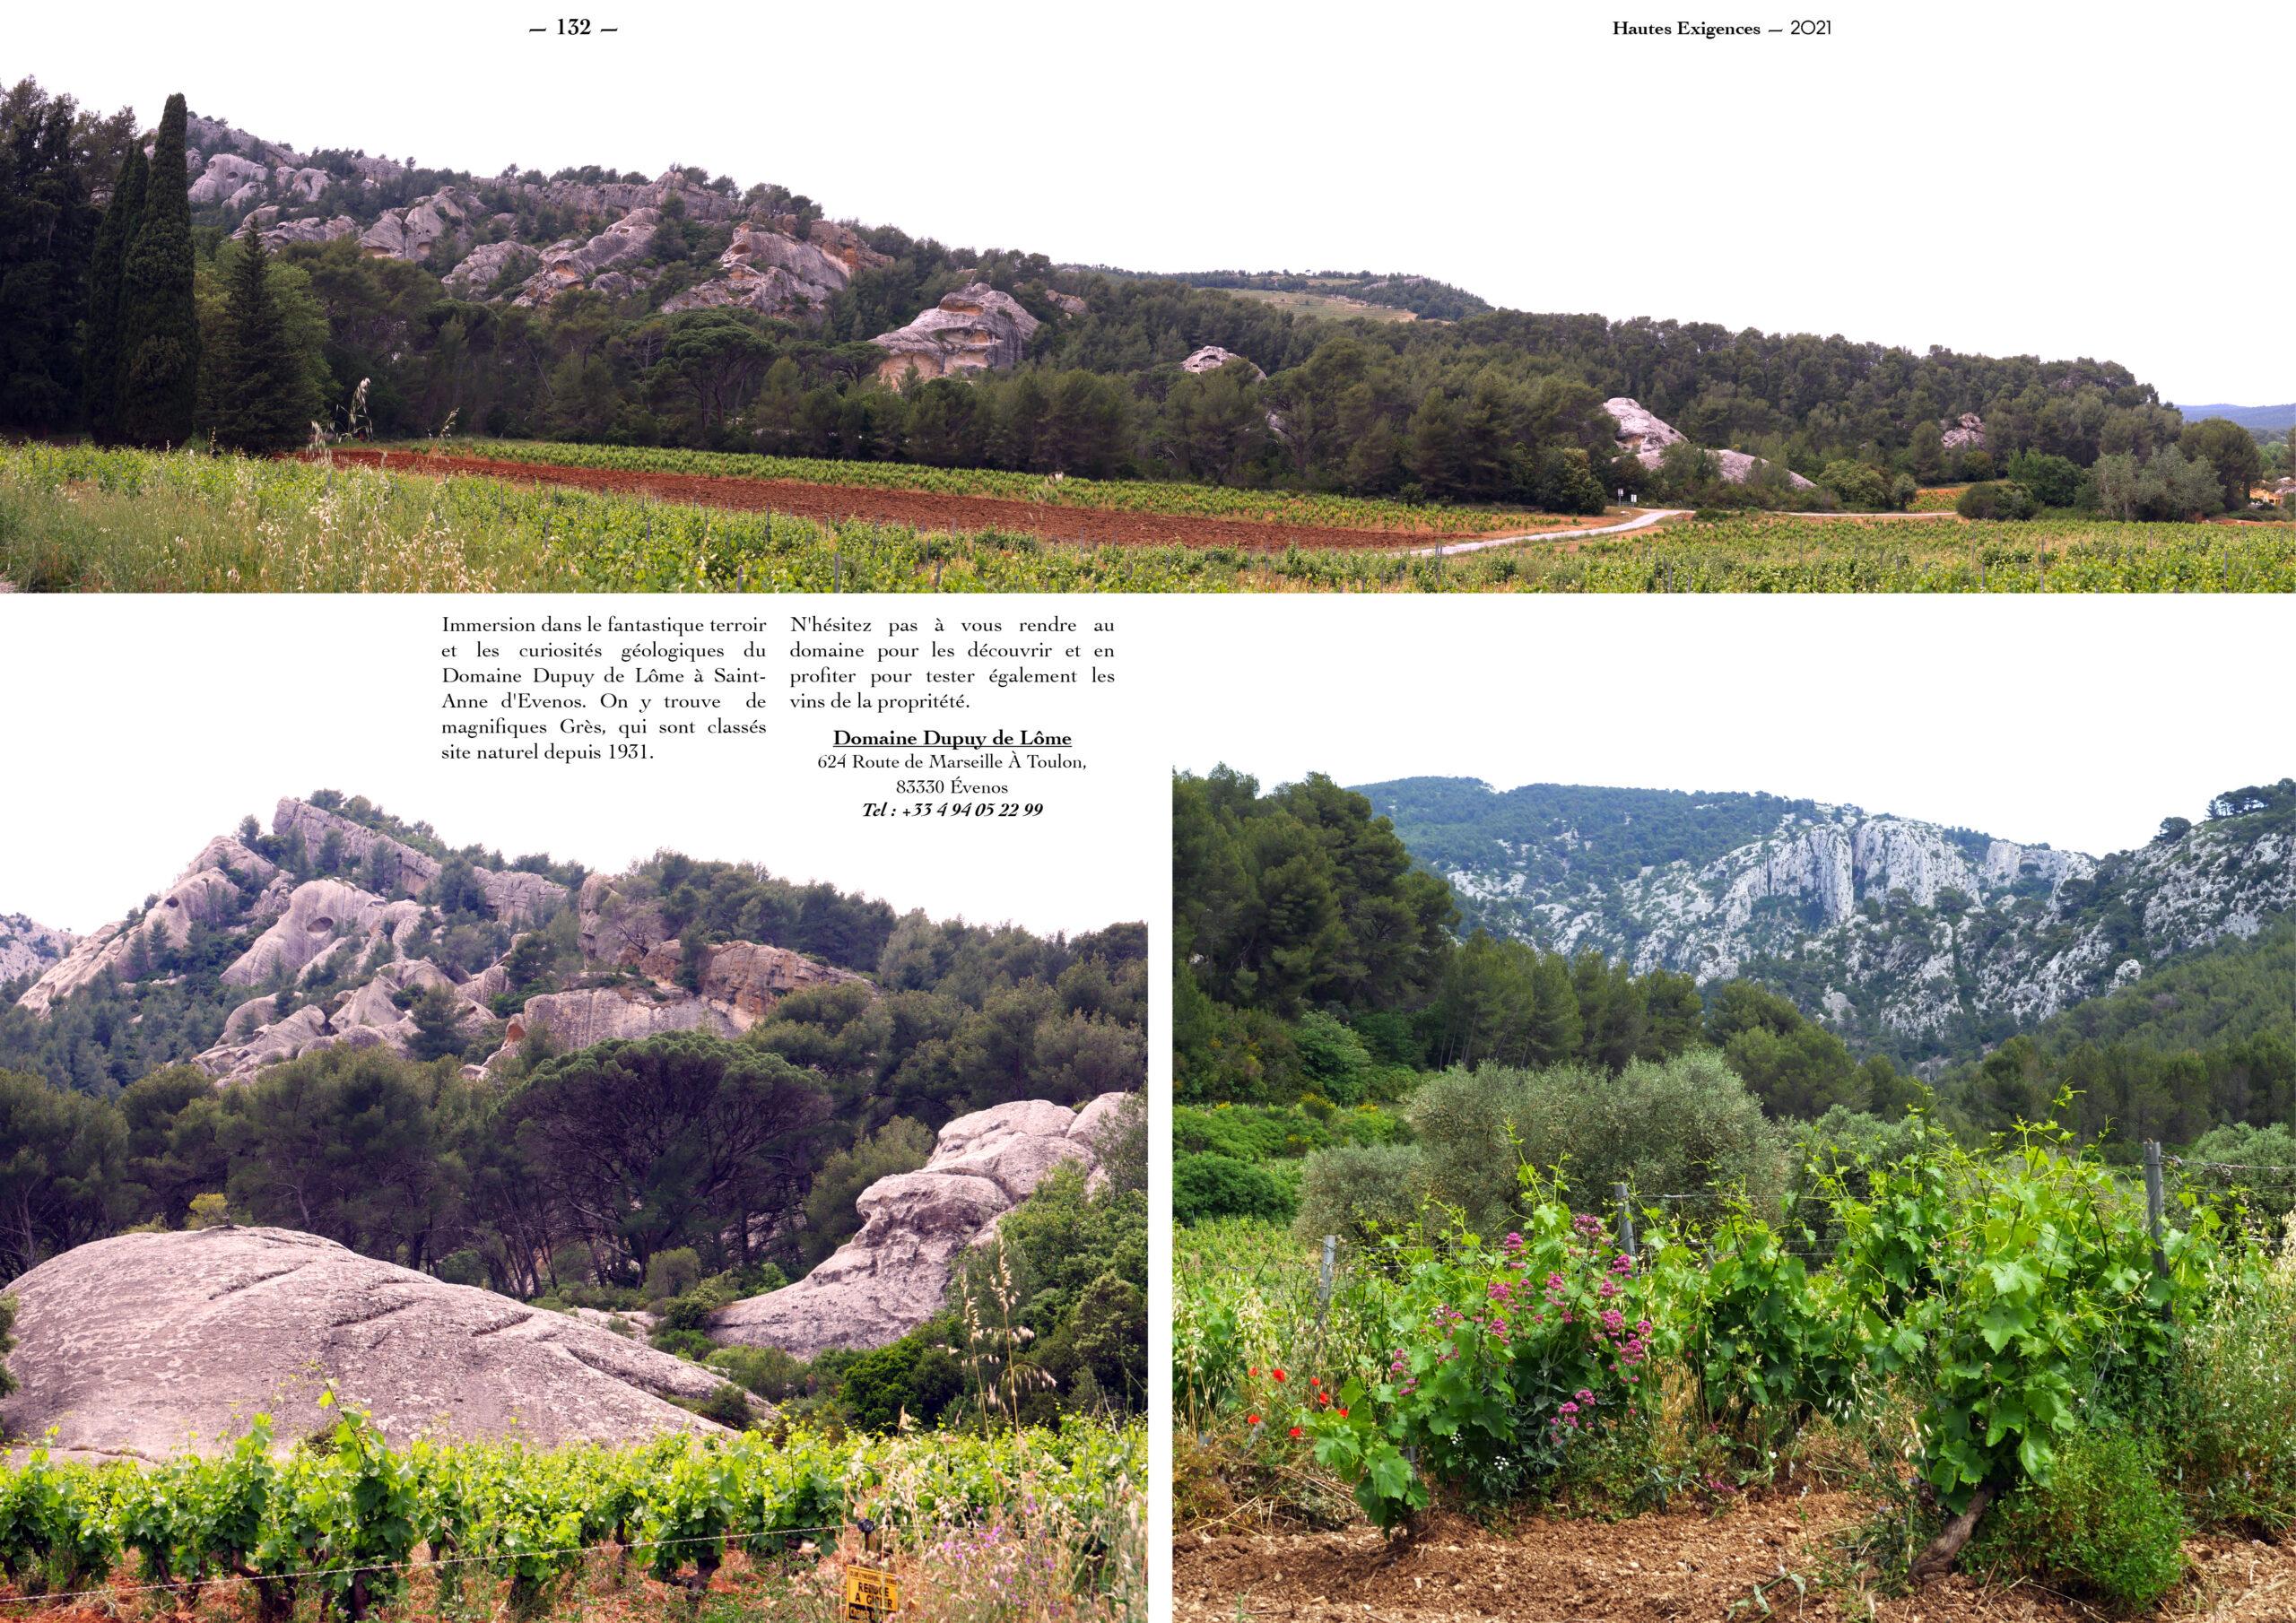 Hautes Exigences Magazine Hors Serie 2021 page 130-131